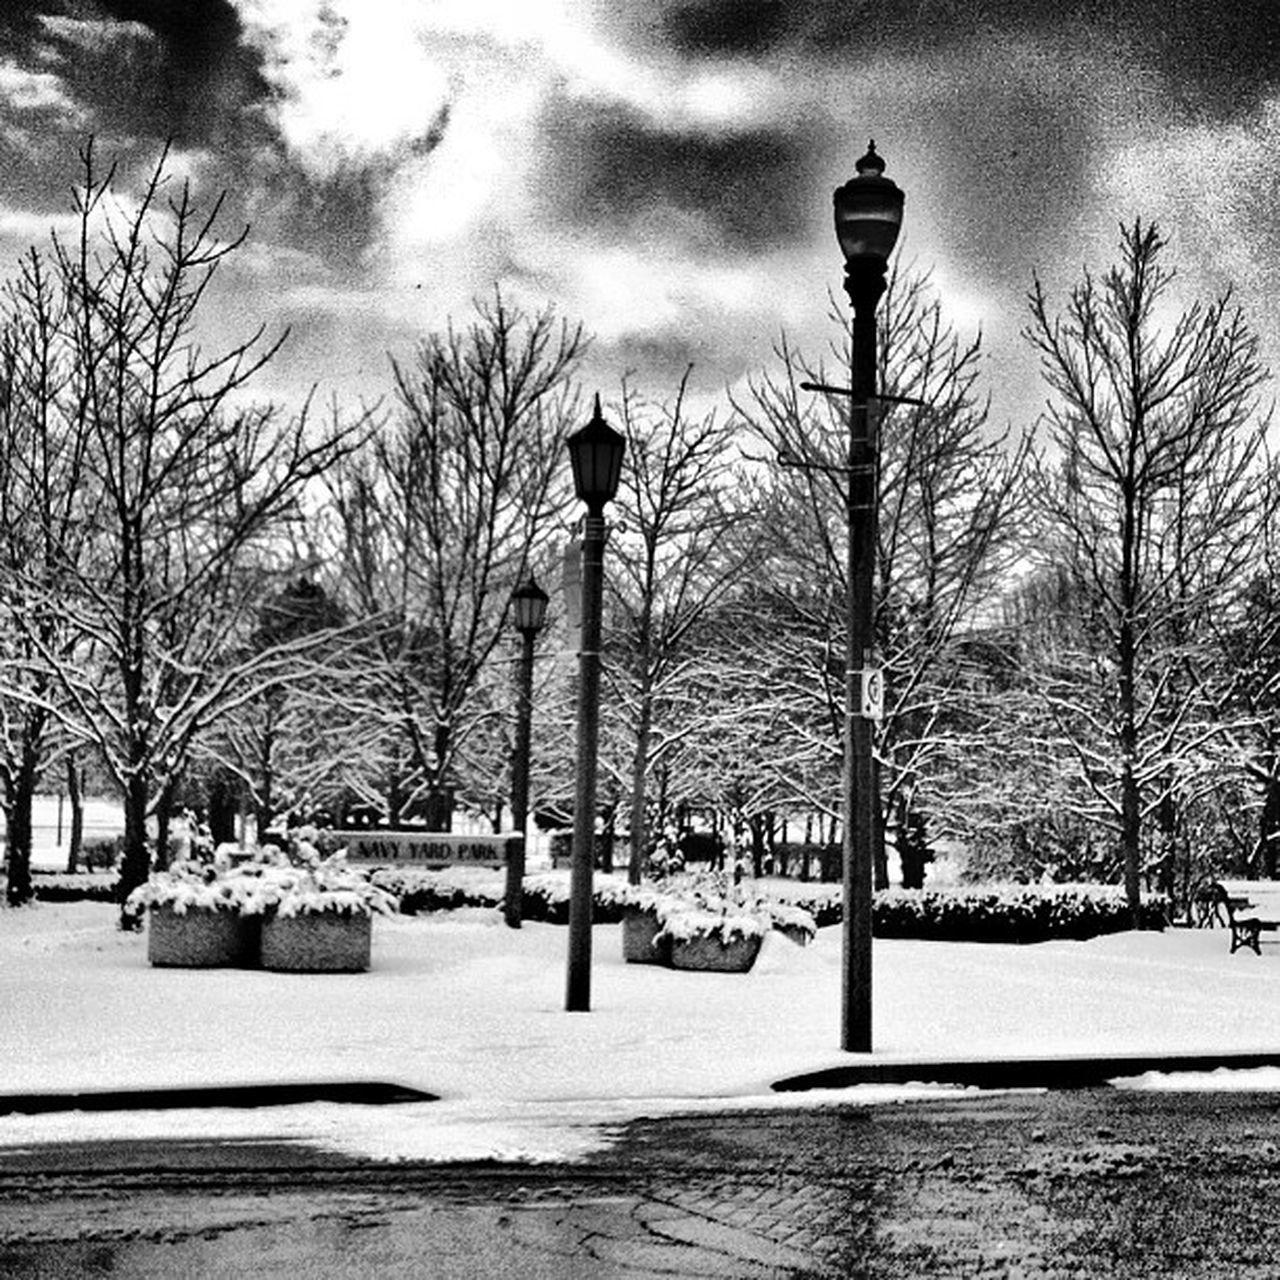 Amherstburg Mytown Snapseed Editing  Wintertime Winter Blackandwhite Blackandwhite Photography Hdr Edit